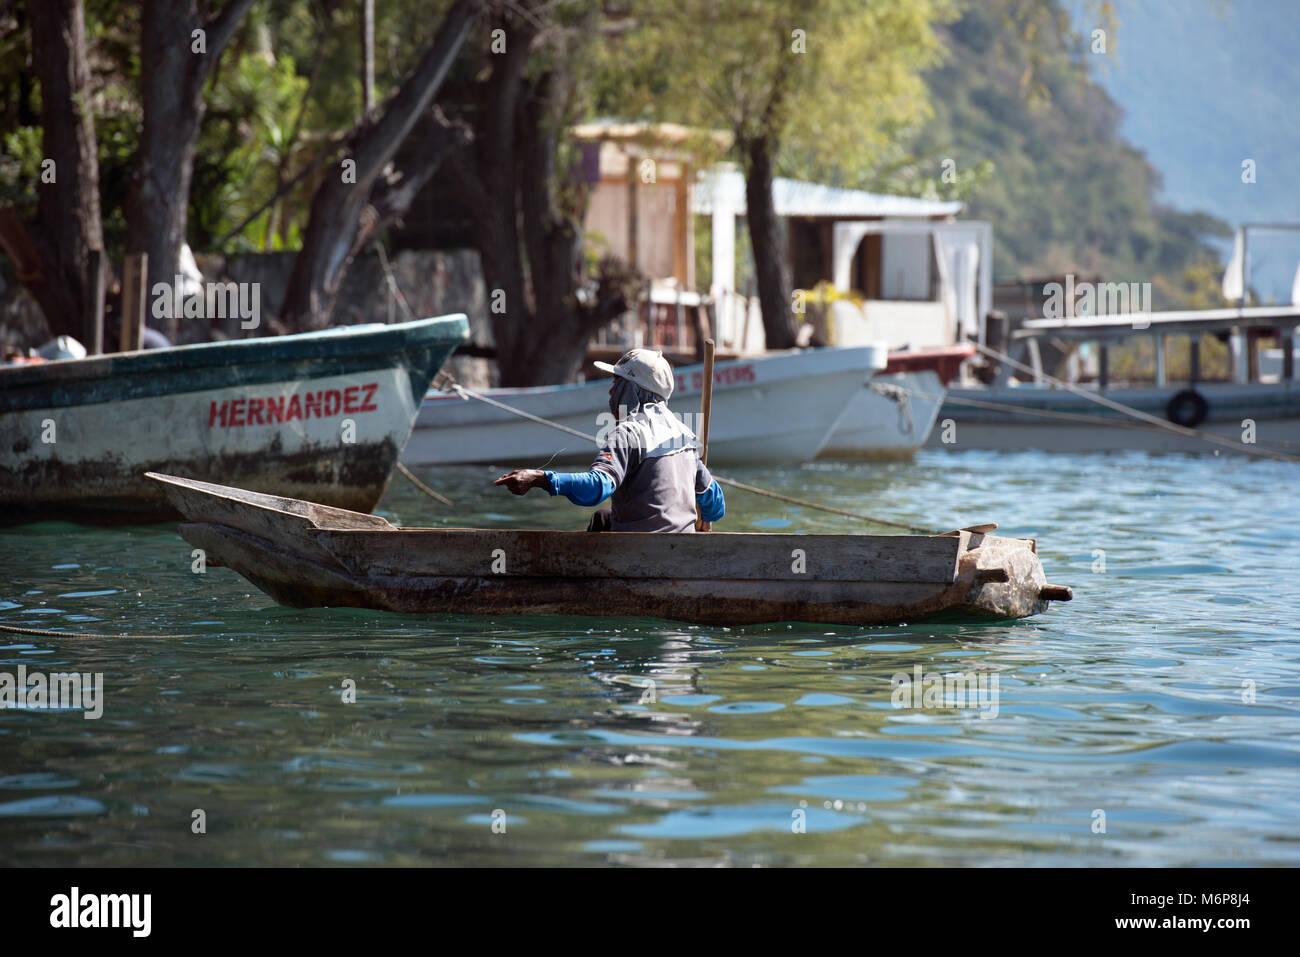 An indigenous, ethnic Mayan man making his living from fishing. Lake Atitlán, Sololá Department, Guatemala. - Stock Image